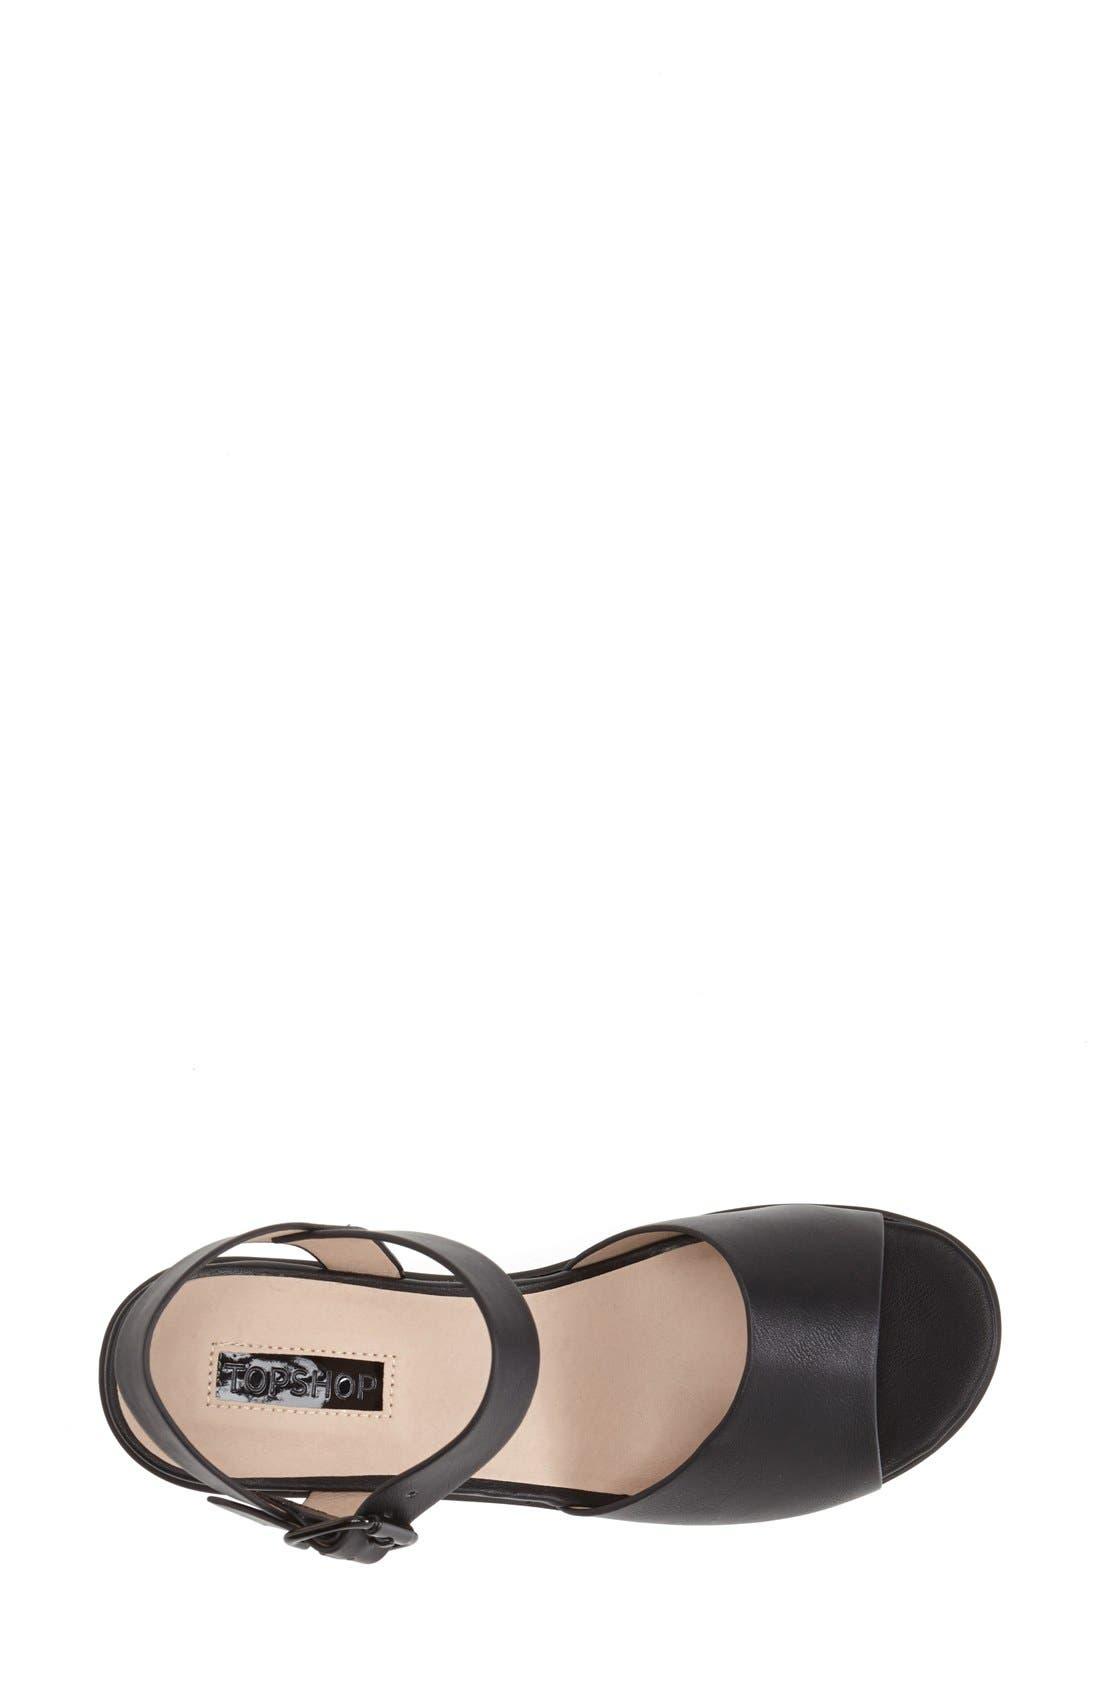 Alternate Image 3  - Topshop 'Hatty' Ankle Strap Sandal (Women)